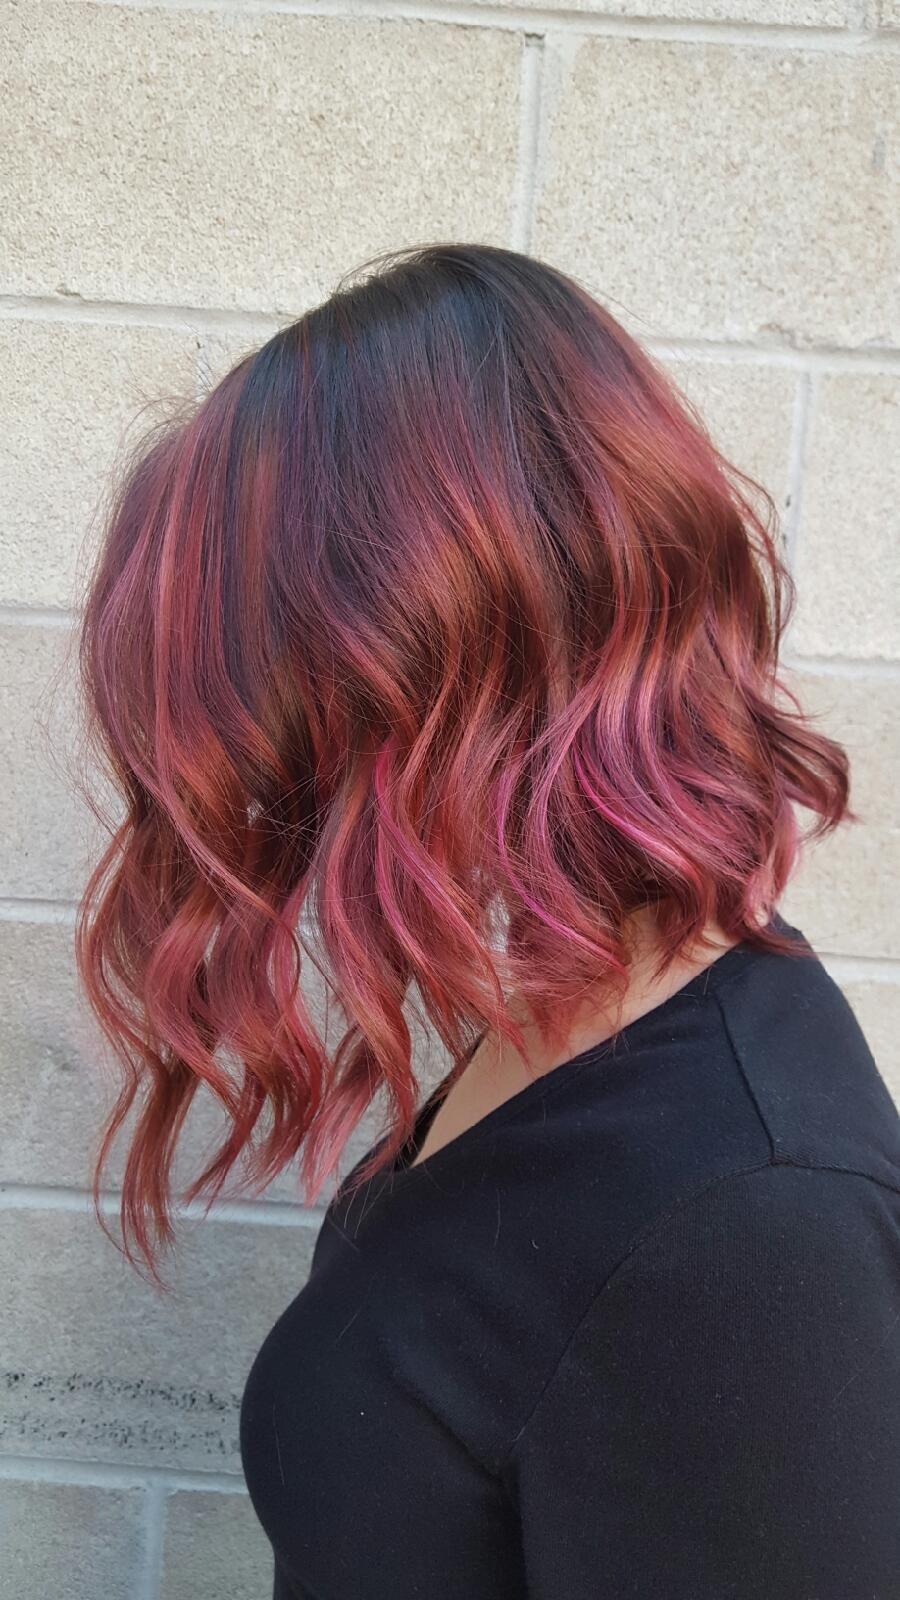 Raspberry, Caramel, Chocolate (dark Rose Gold) Hair With